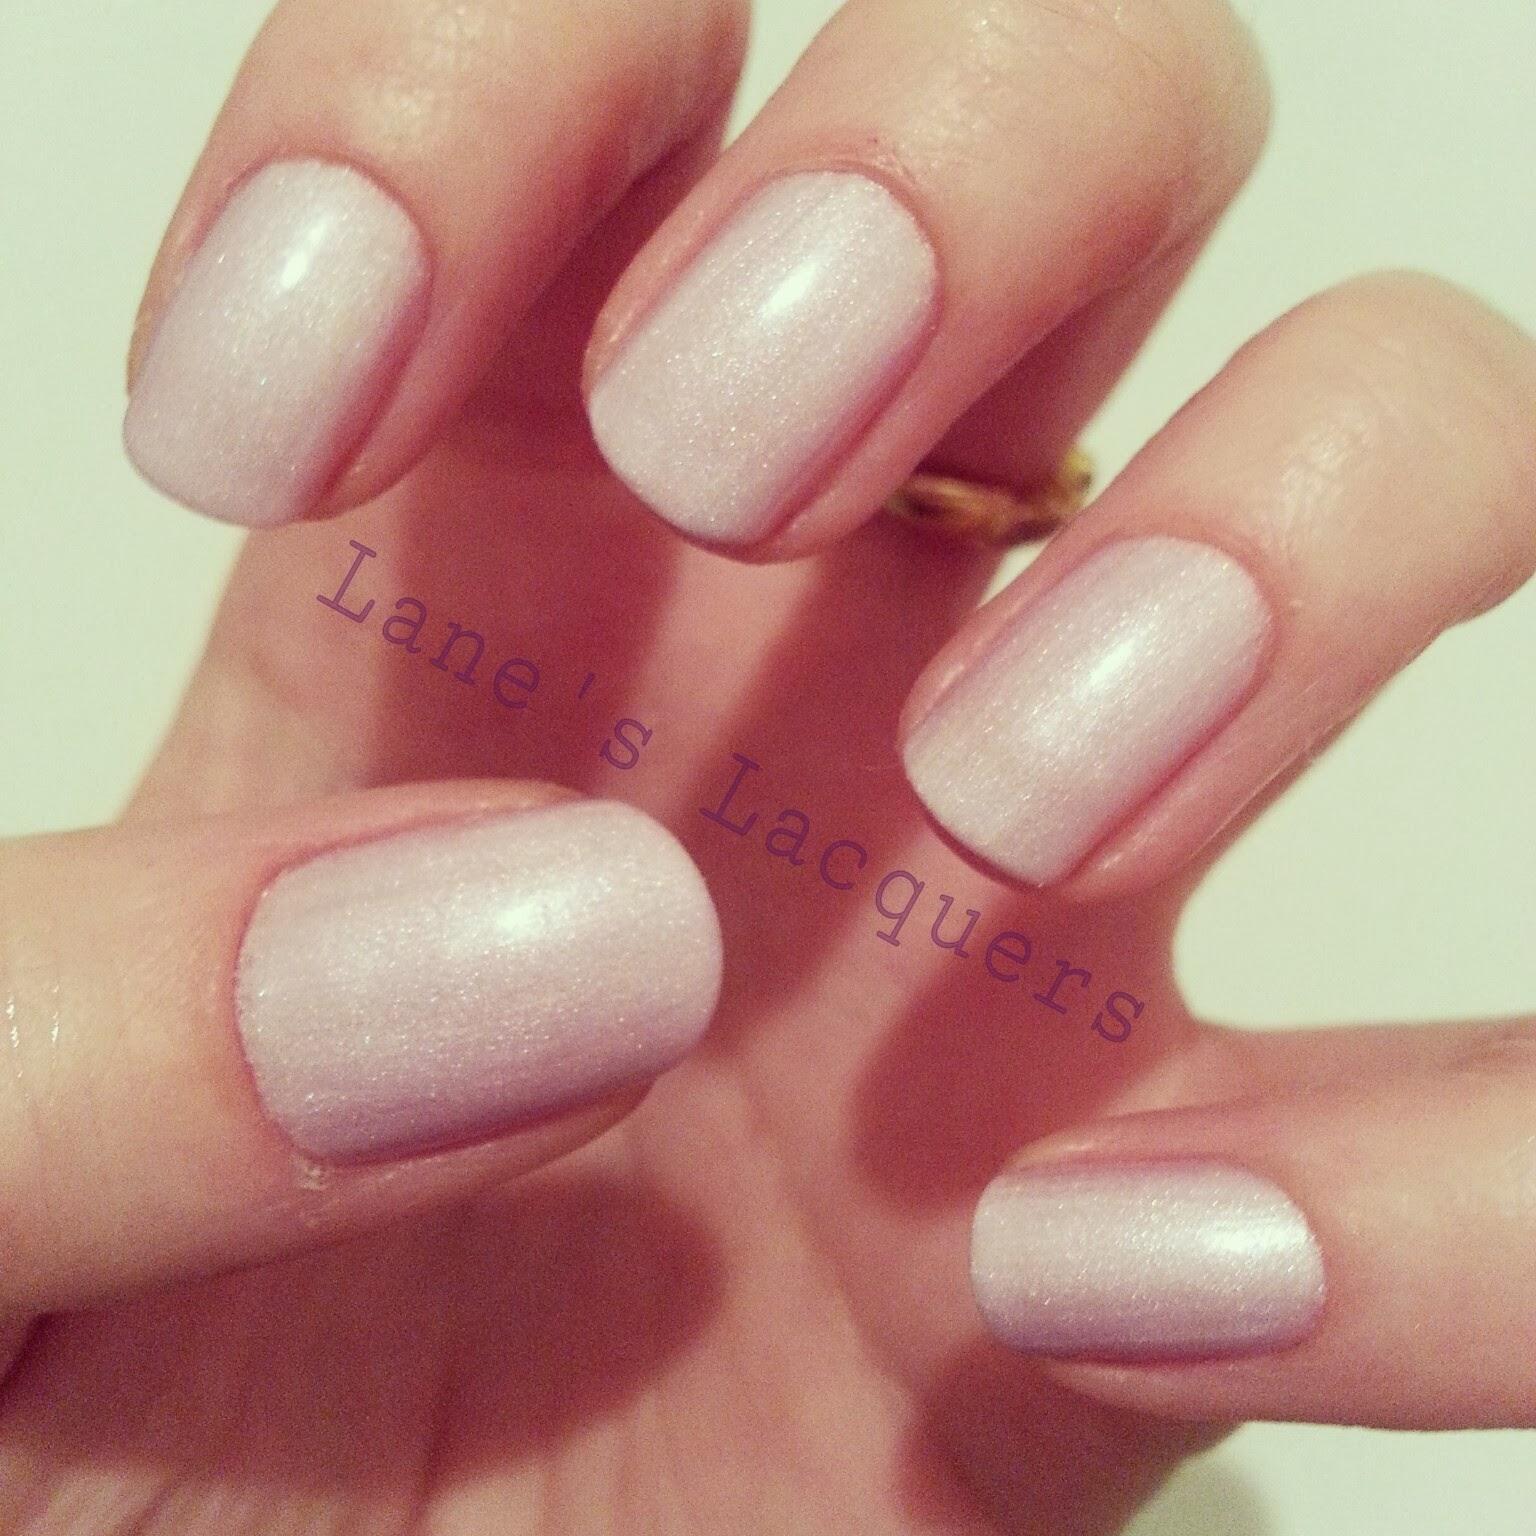 barry-m-silk-heather-swatch-manicure